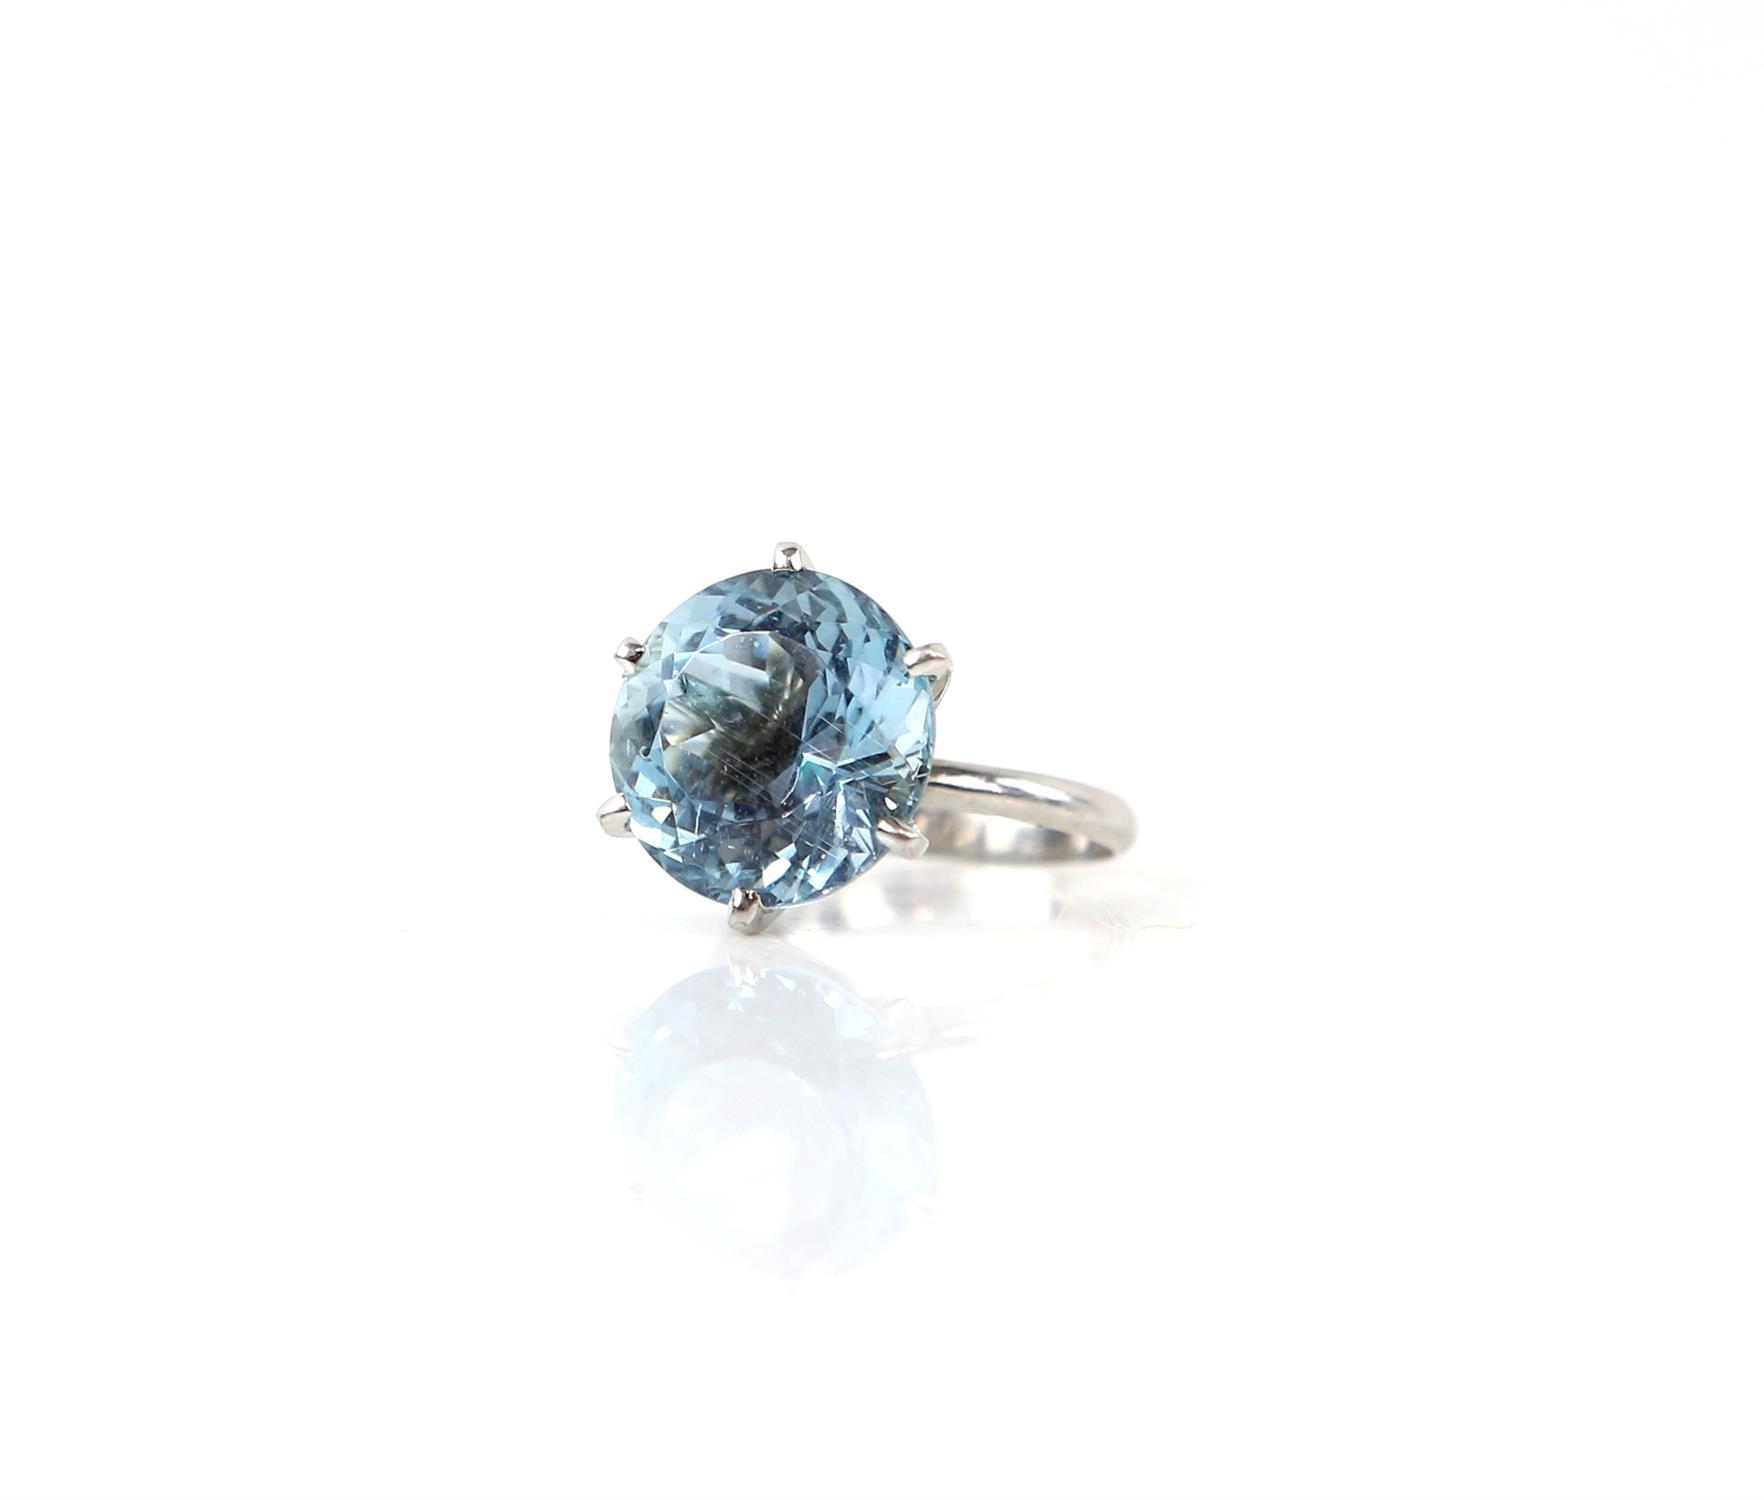 Aquamarine ring, round cut aquamarine, estimated weight 8.80 carats, mount testing as 18 ct, - Image 7 of 9